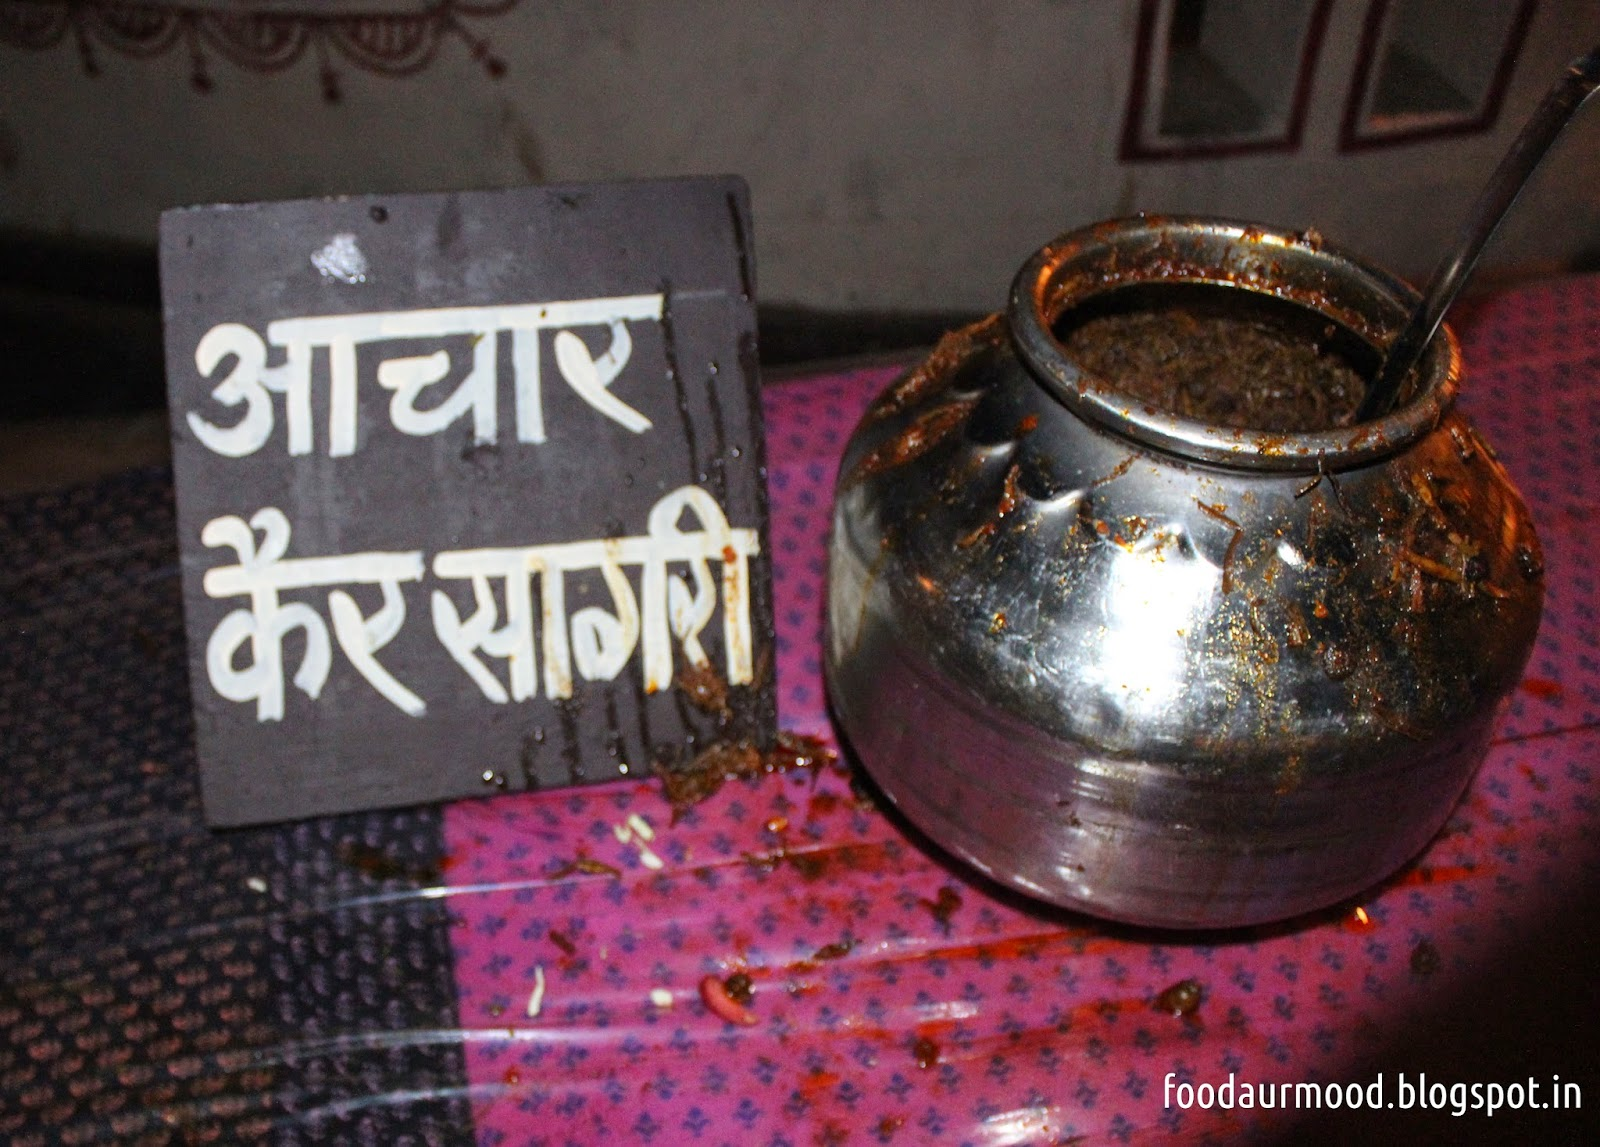 chowki dhaani, food